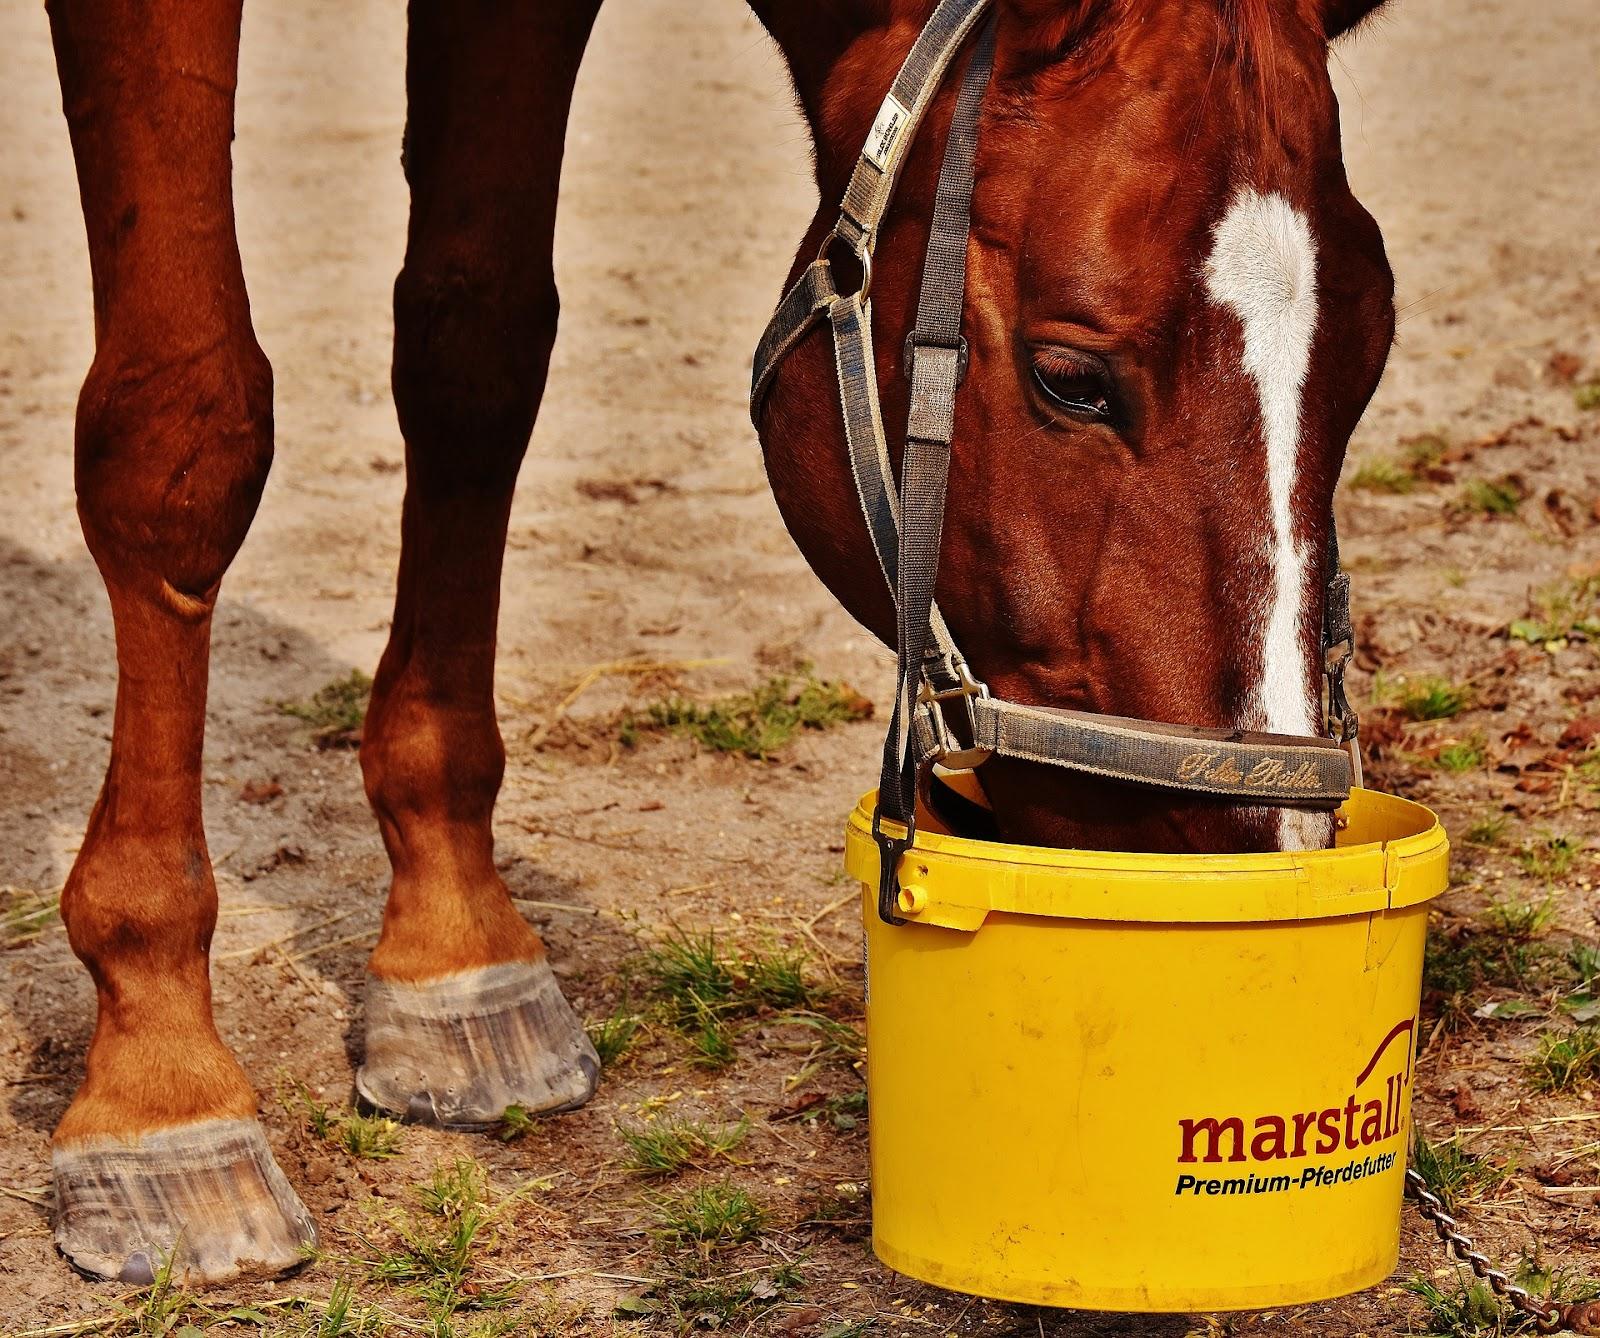 Chestnut show horse eats from a yellow grain bucket